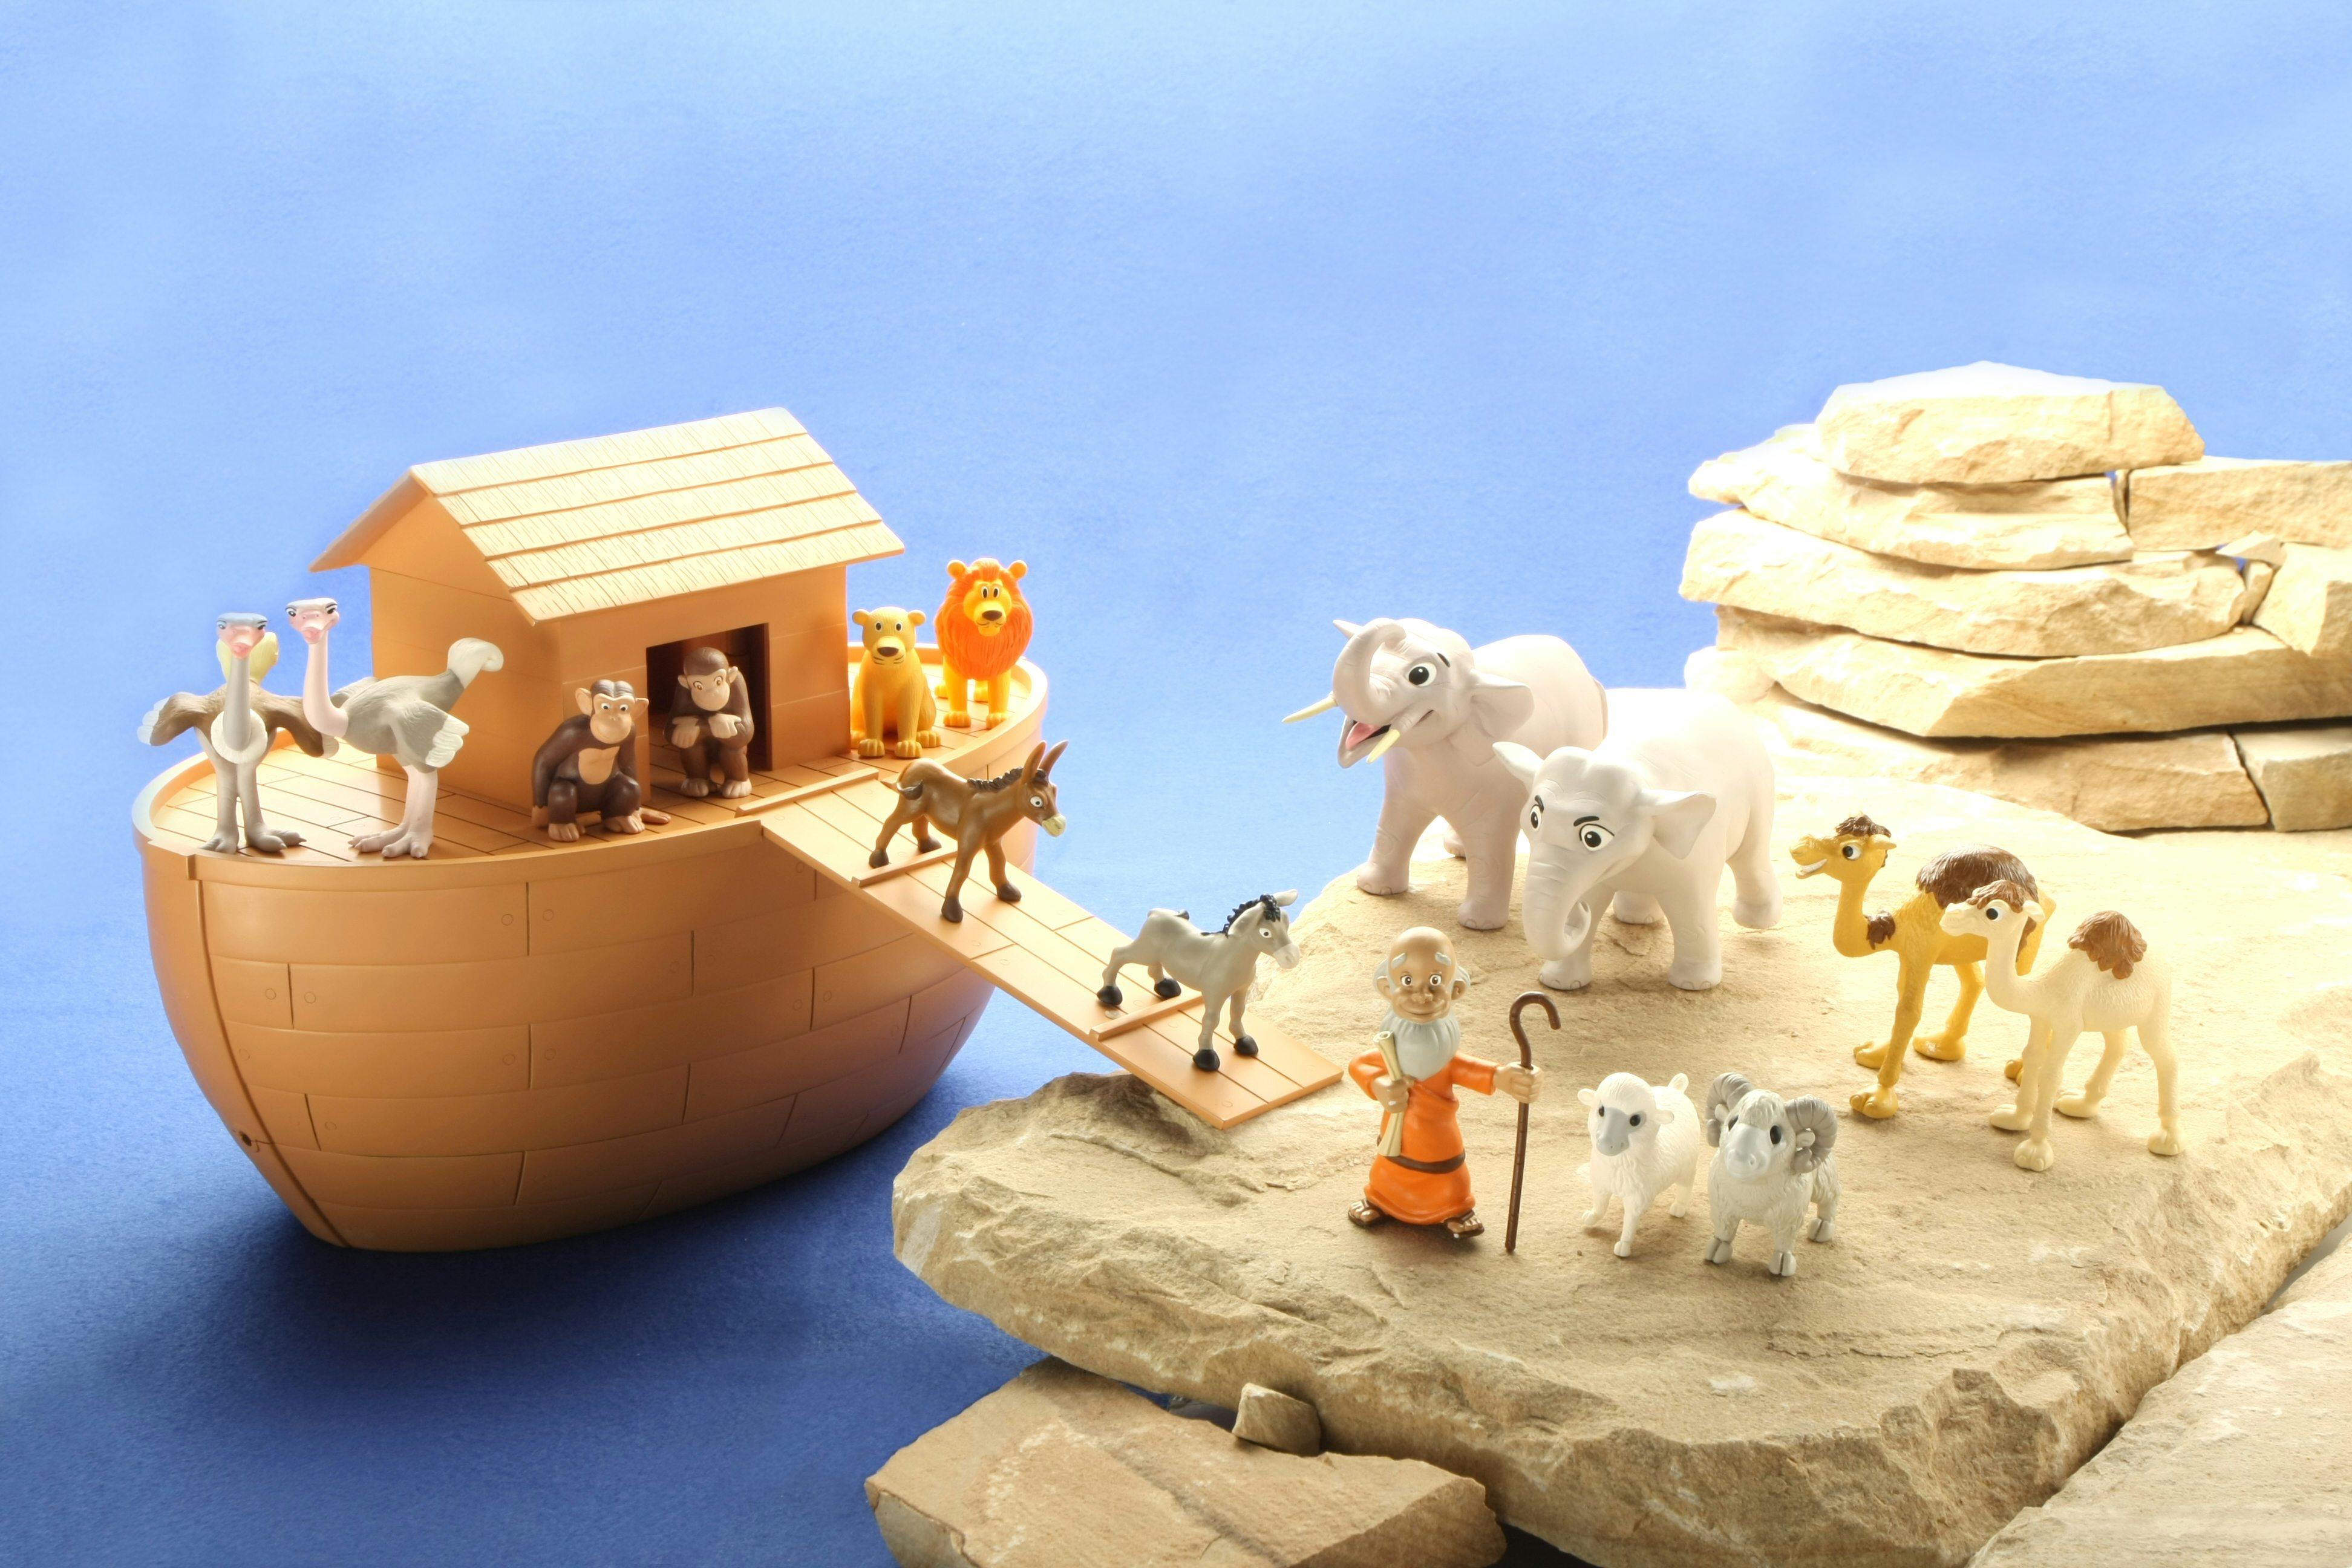 naoh's ark